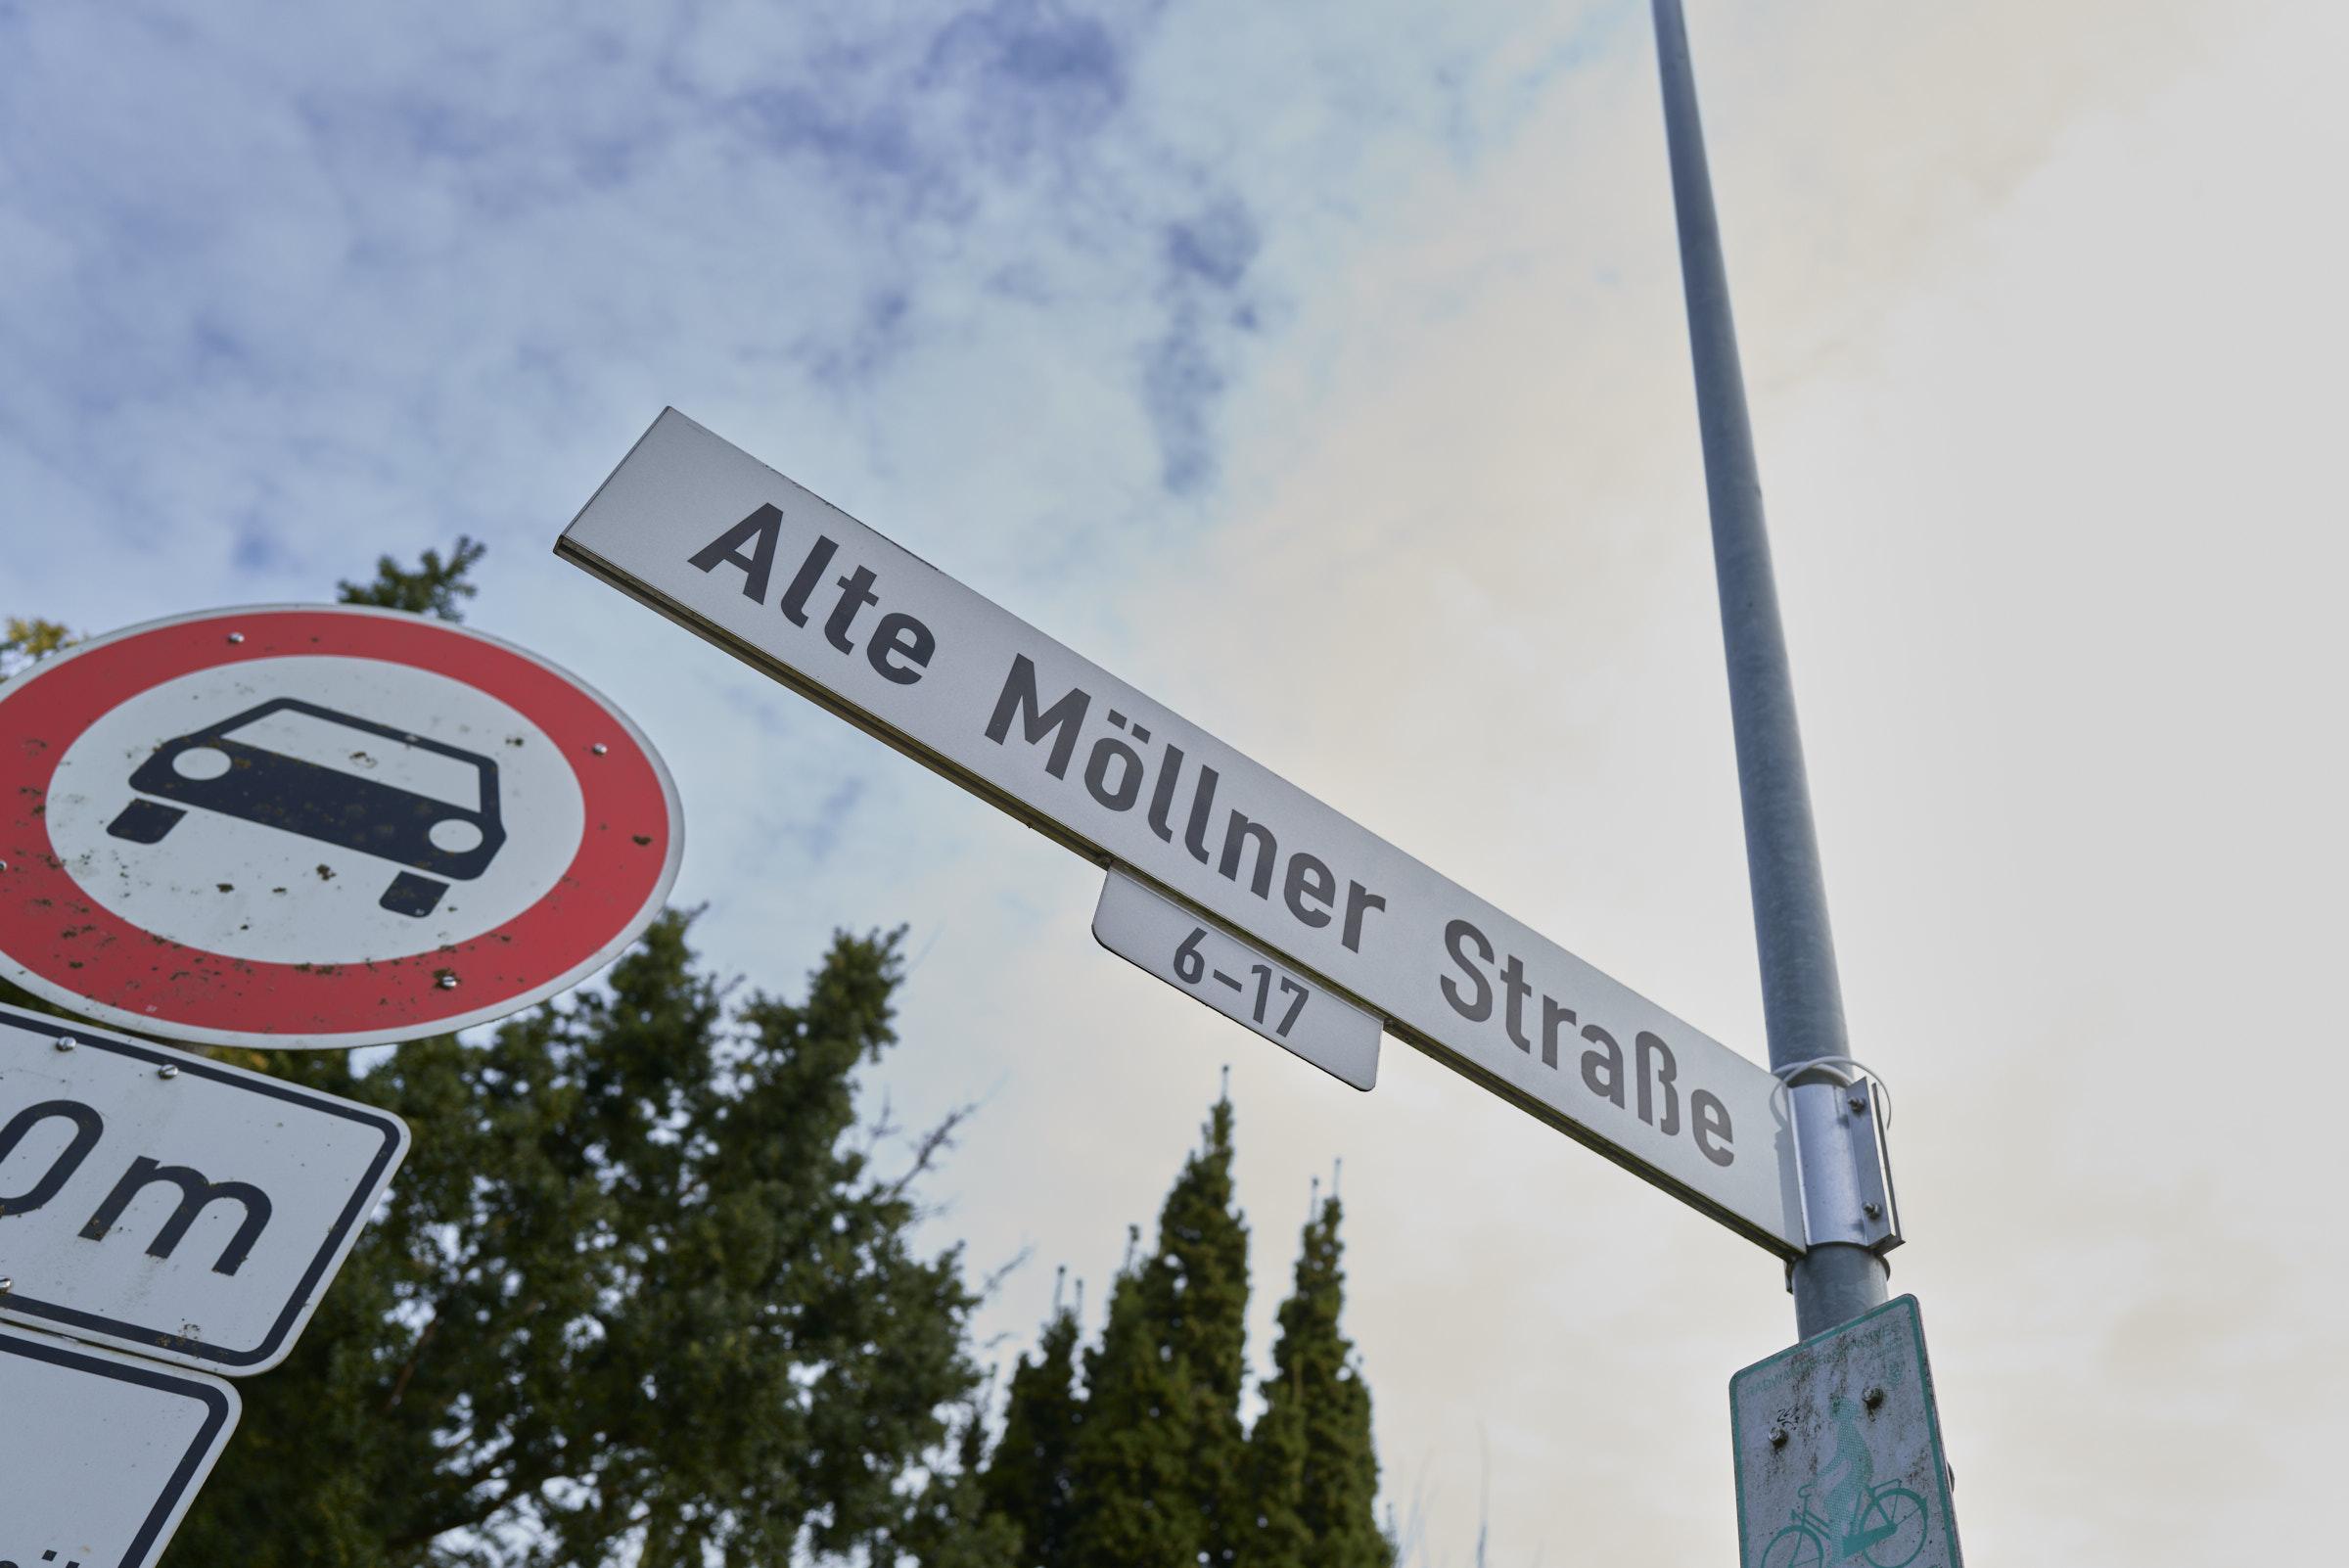 AlteMoellnerStrasse_2